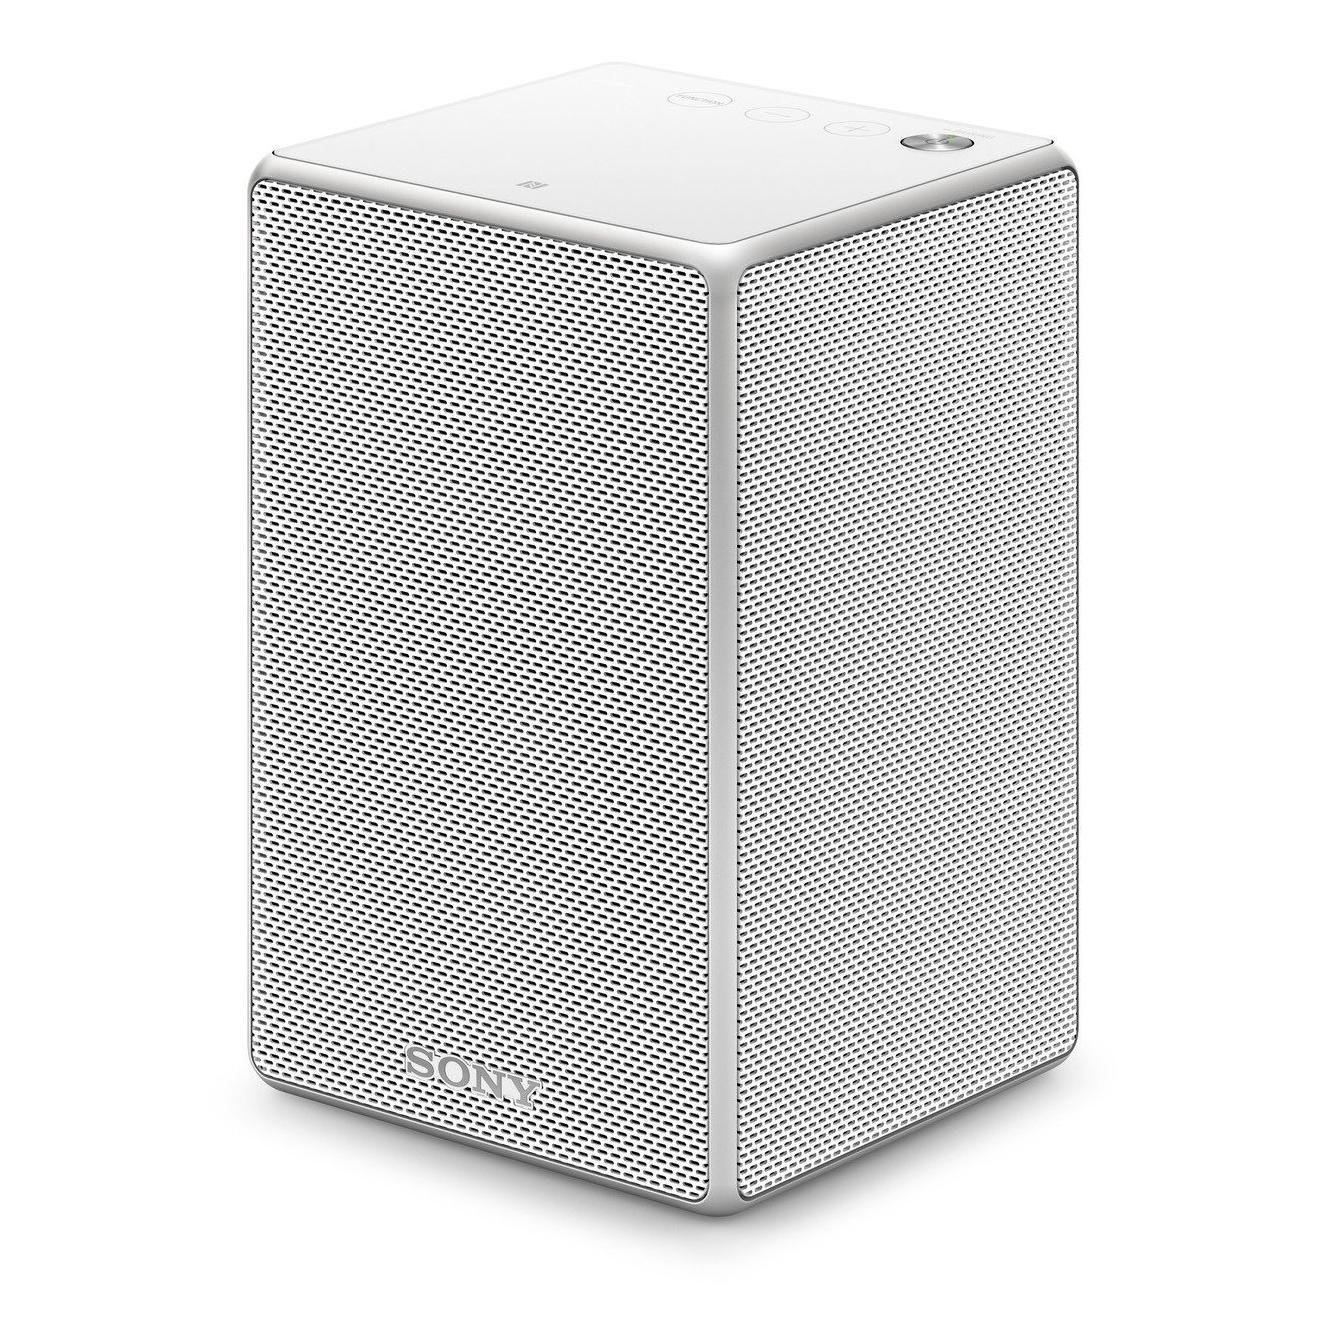 Портативная акустика Sony SRS-ZR5, Bluetooth, NFC, Wi-Fi Белый со скидкой